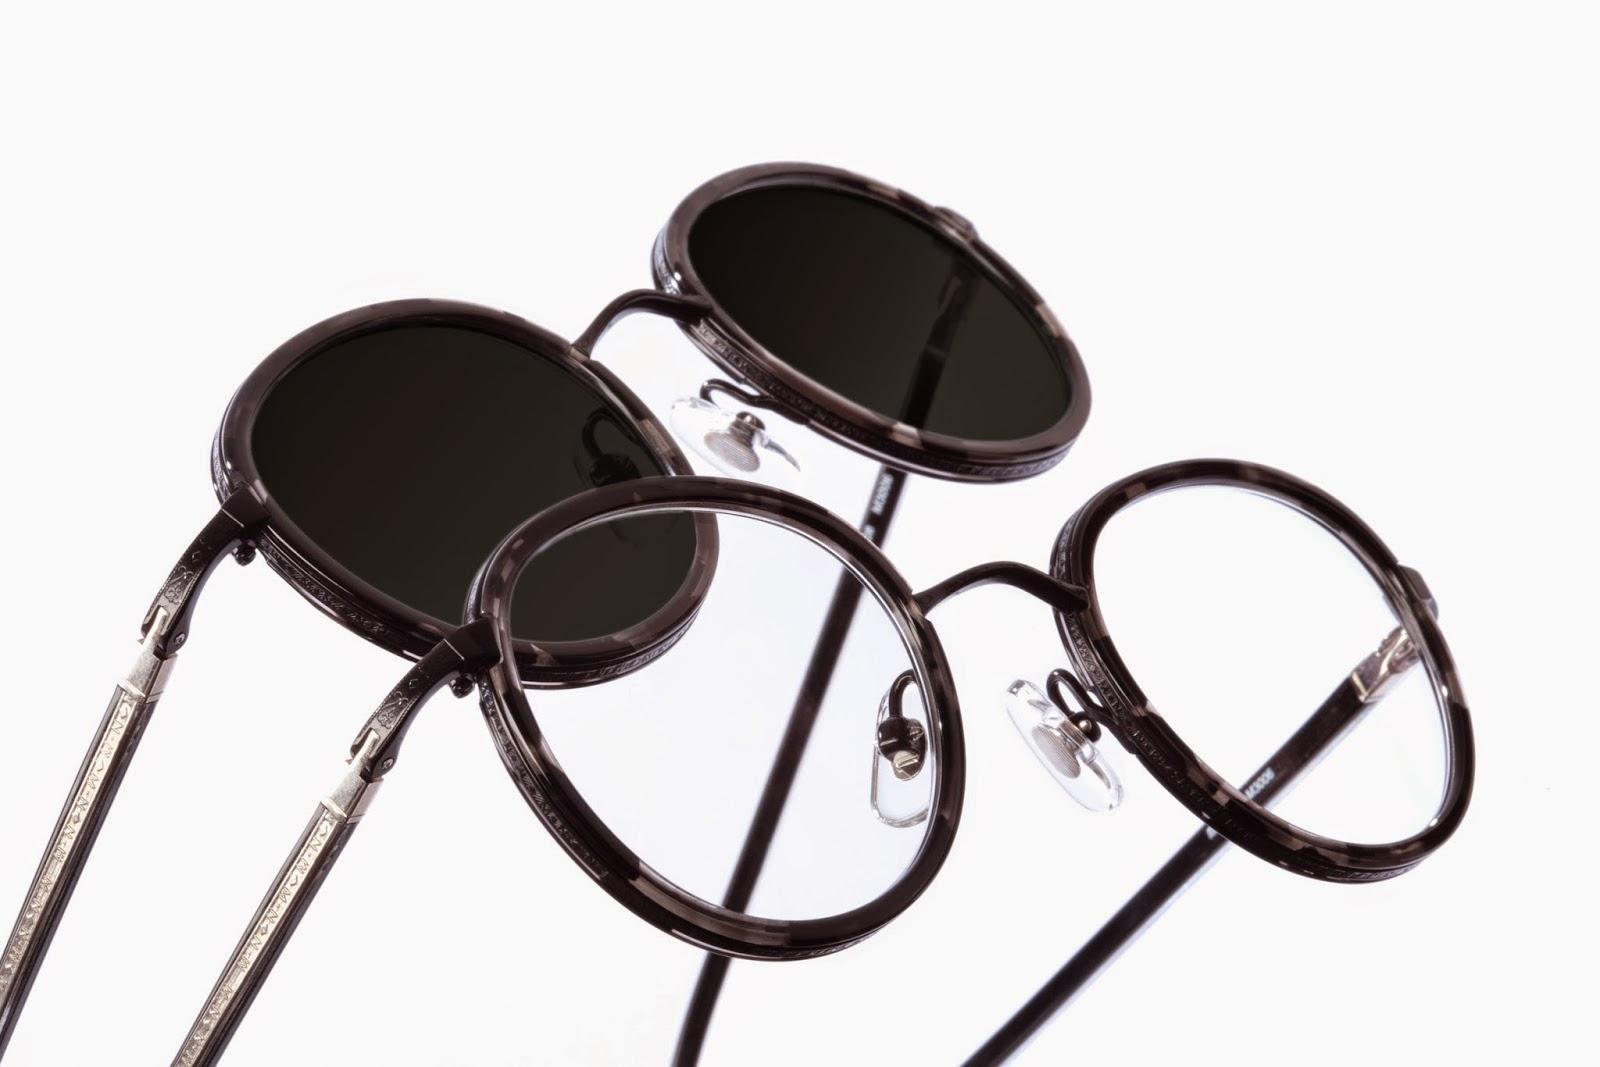 Matsuda M3006 and Transitions lenses